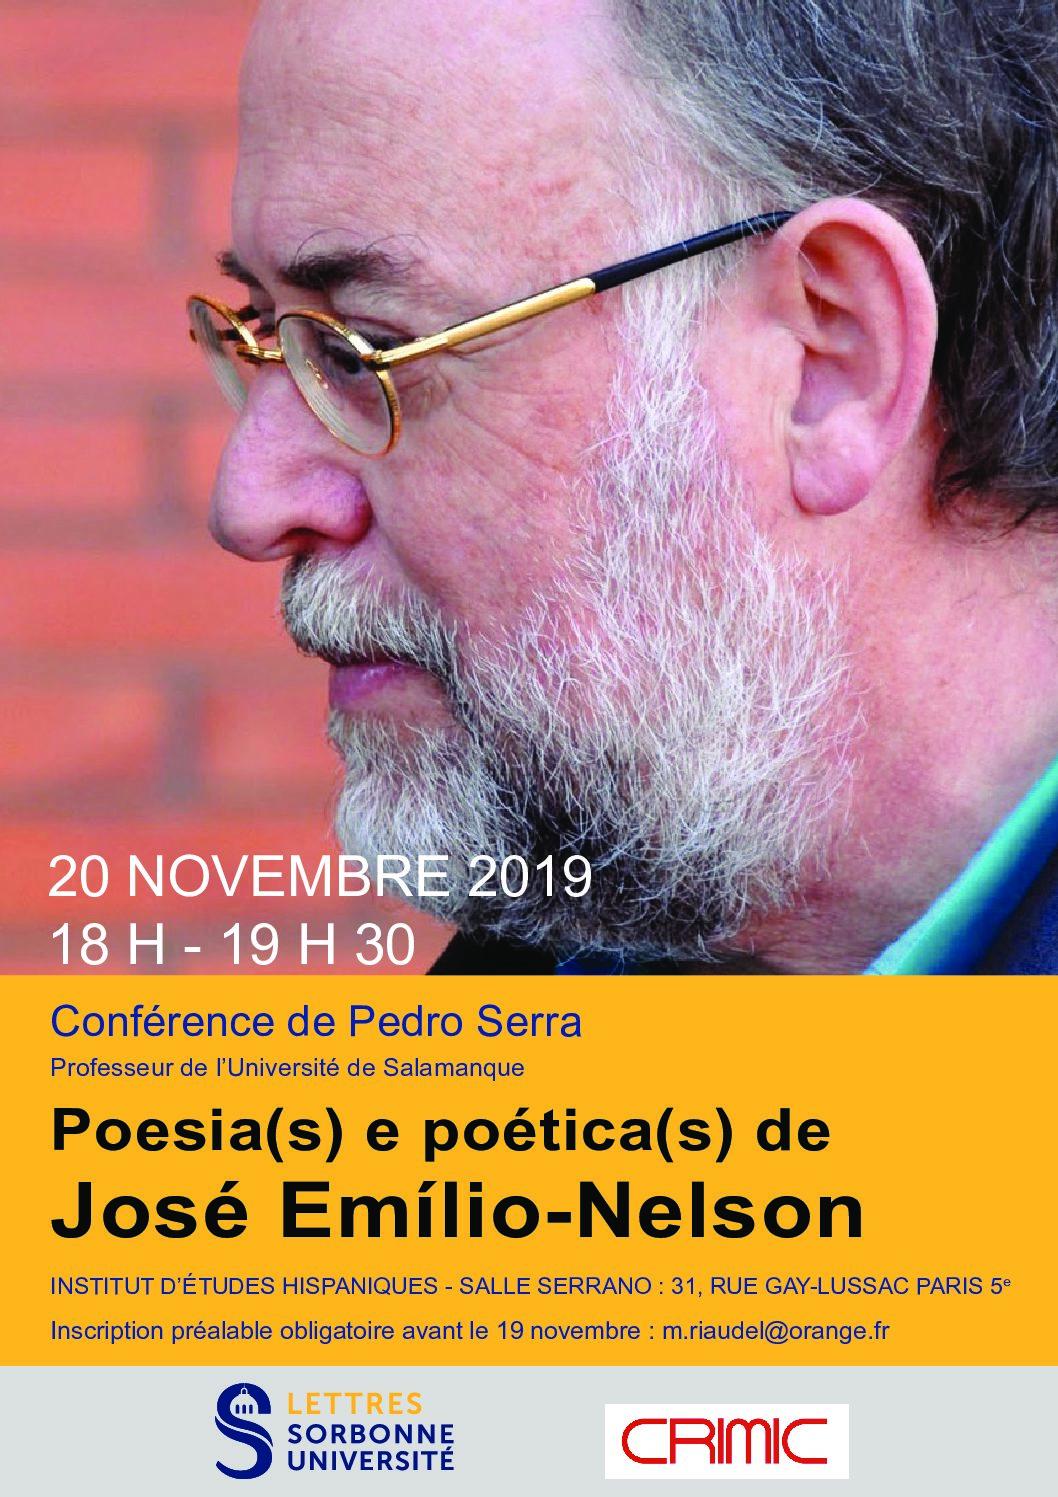 Poesia(s) e poética(s) de José Emílio-Nelson